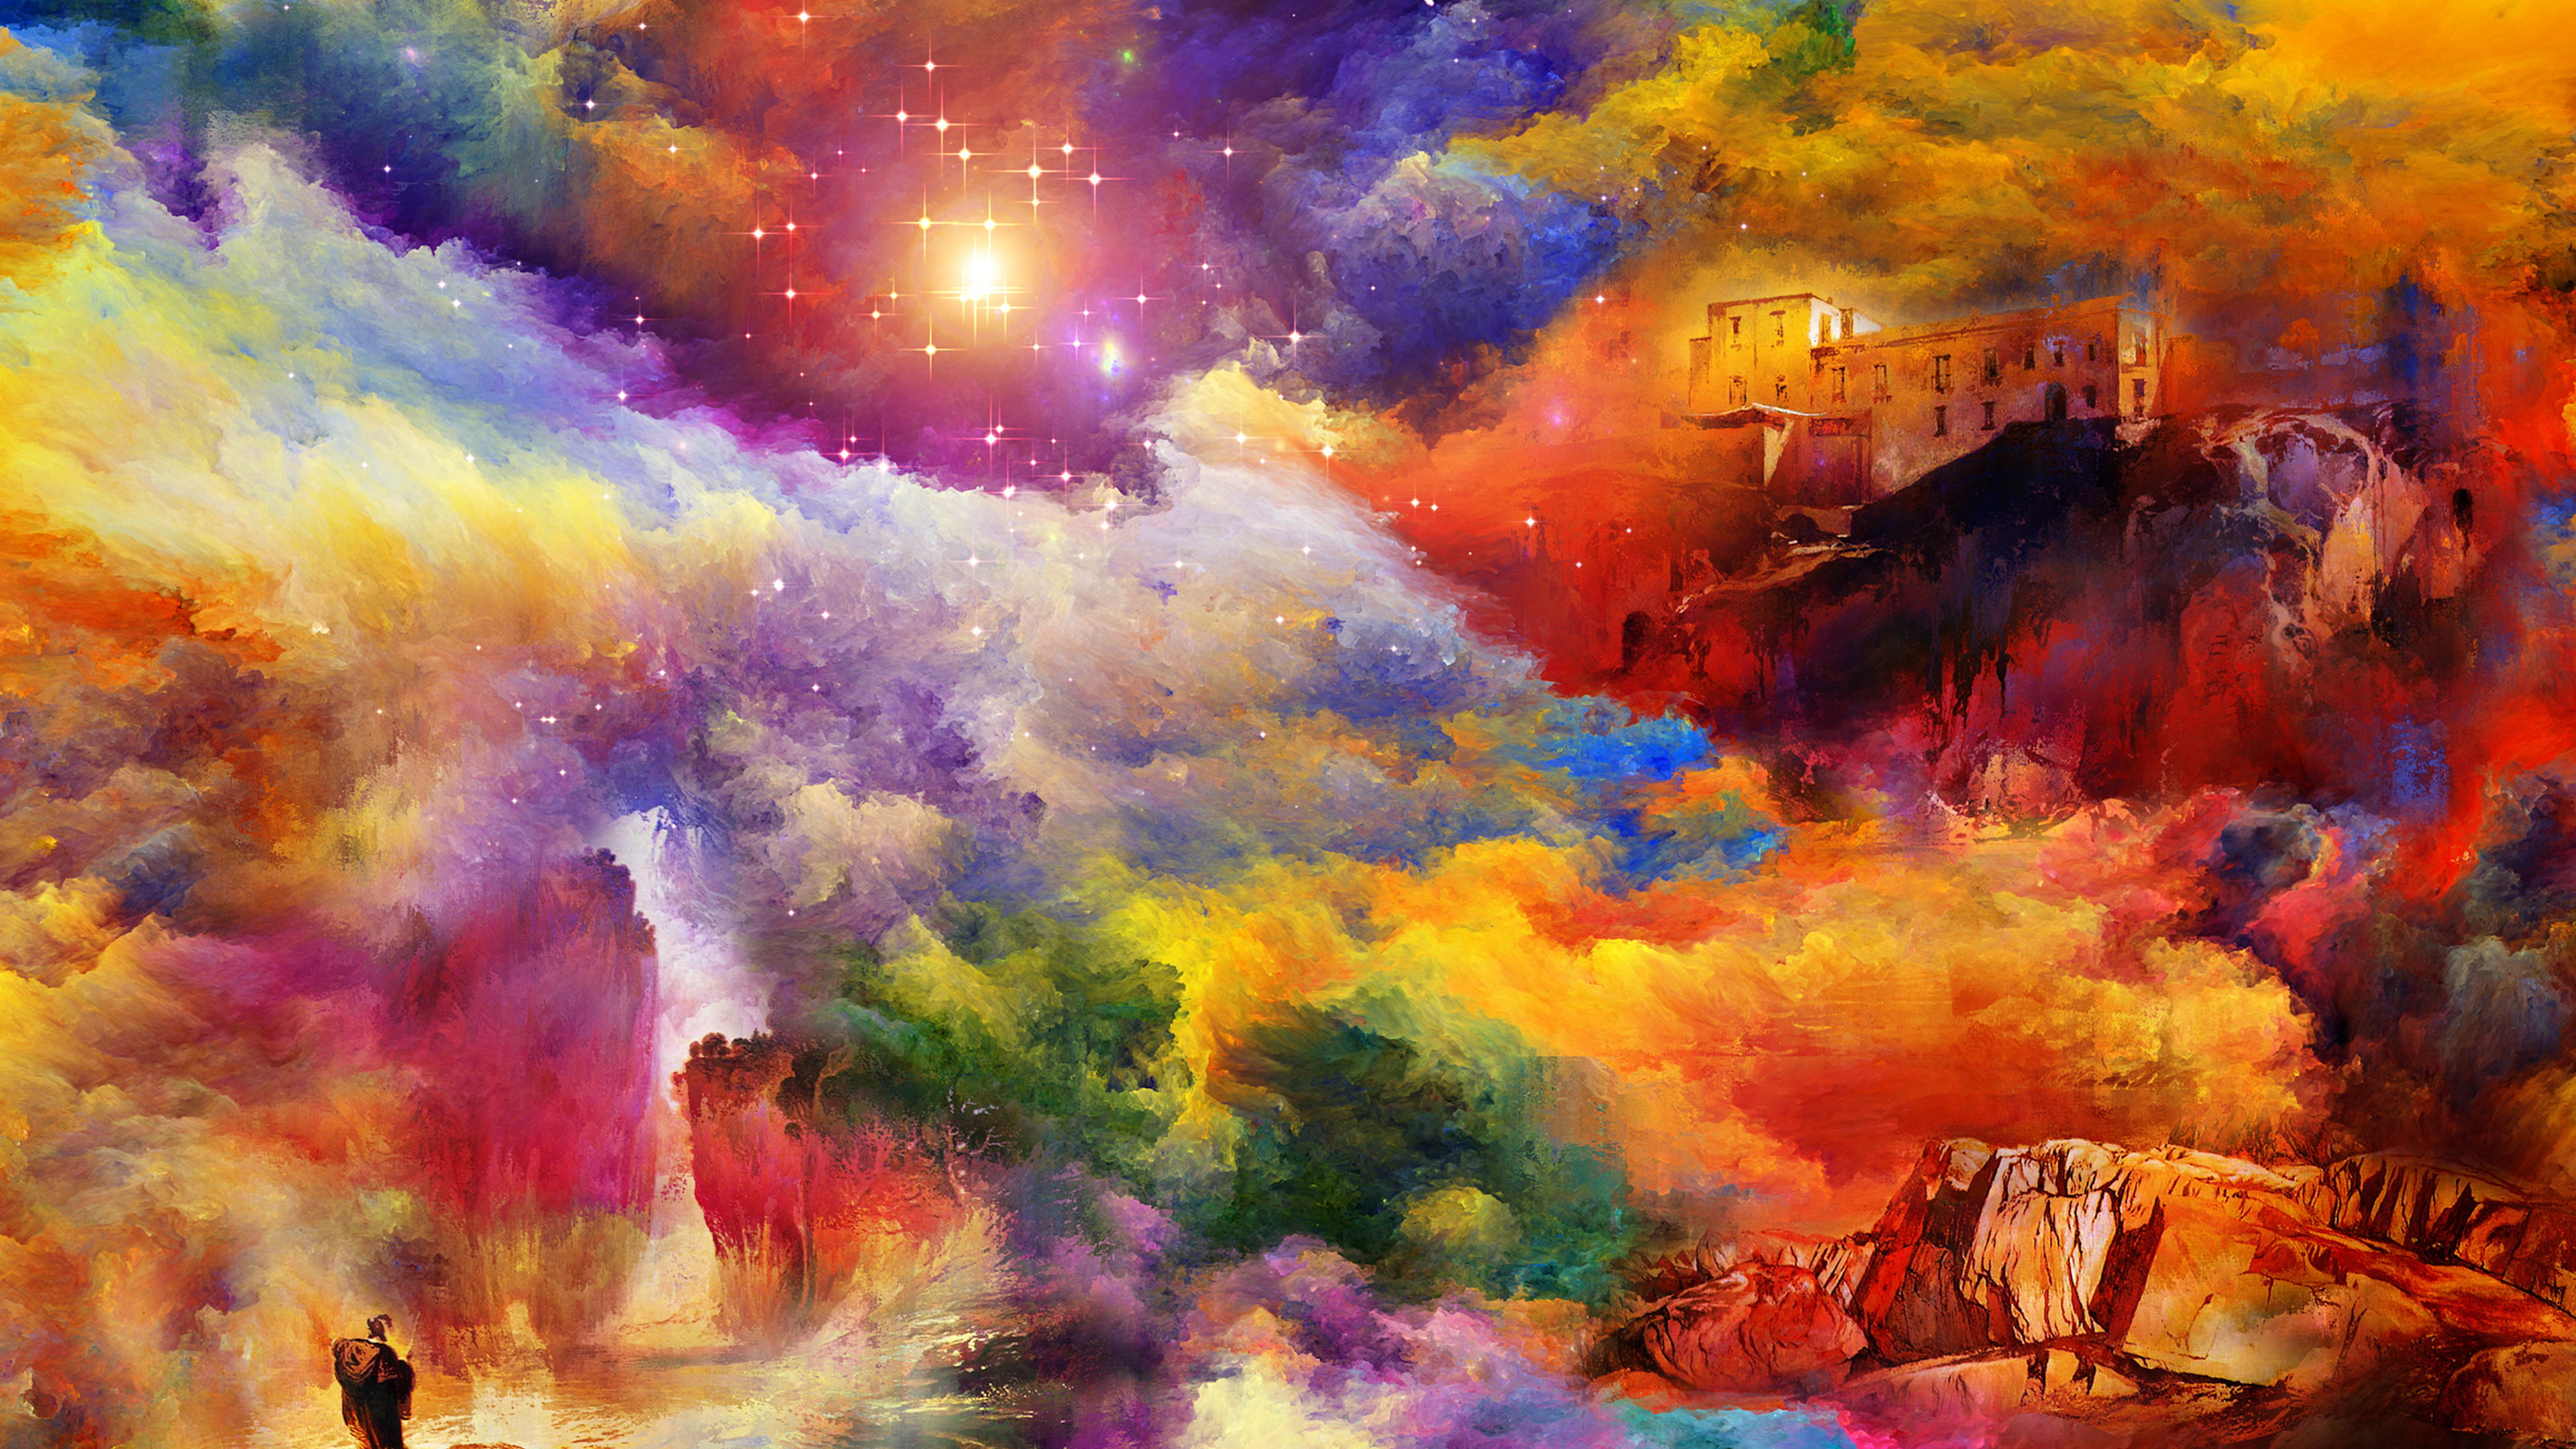 726990 Title Fantasy Landscape Artistic Fantasy Colors 4k Paintings 3840x2160 Download Hd Wallpaper Wallpapertip